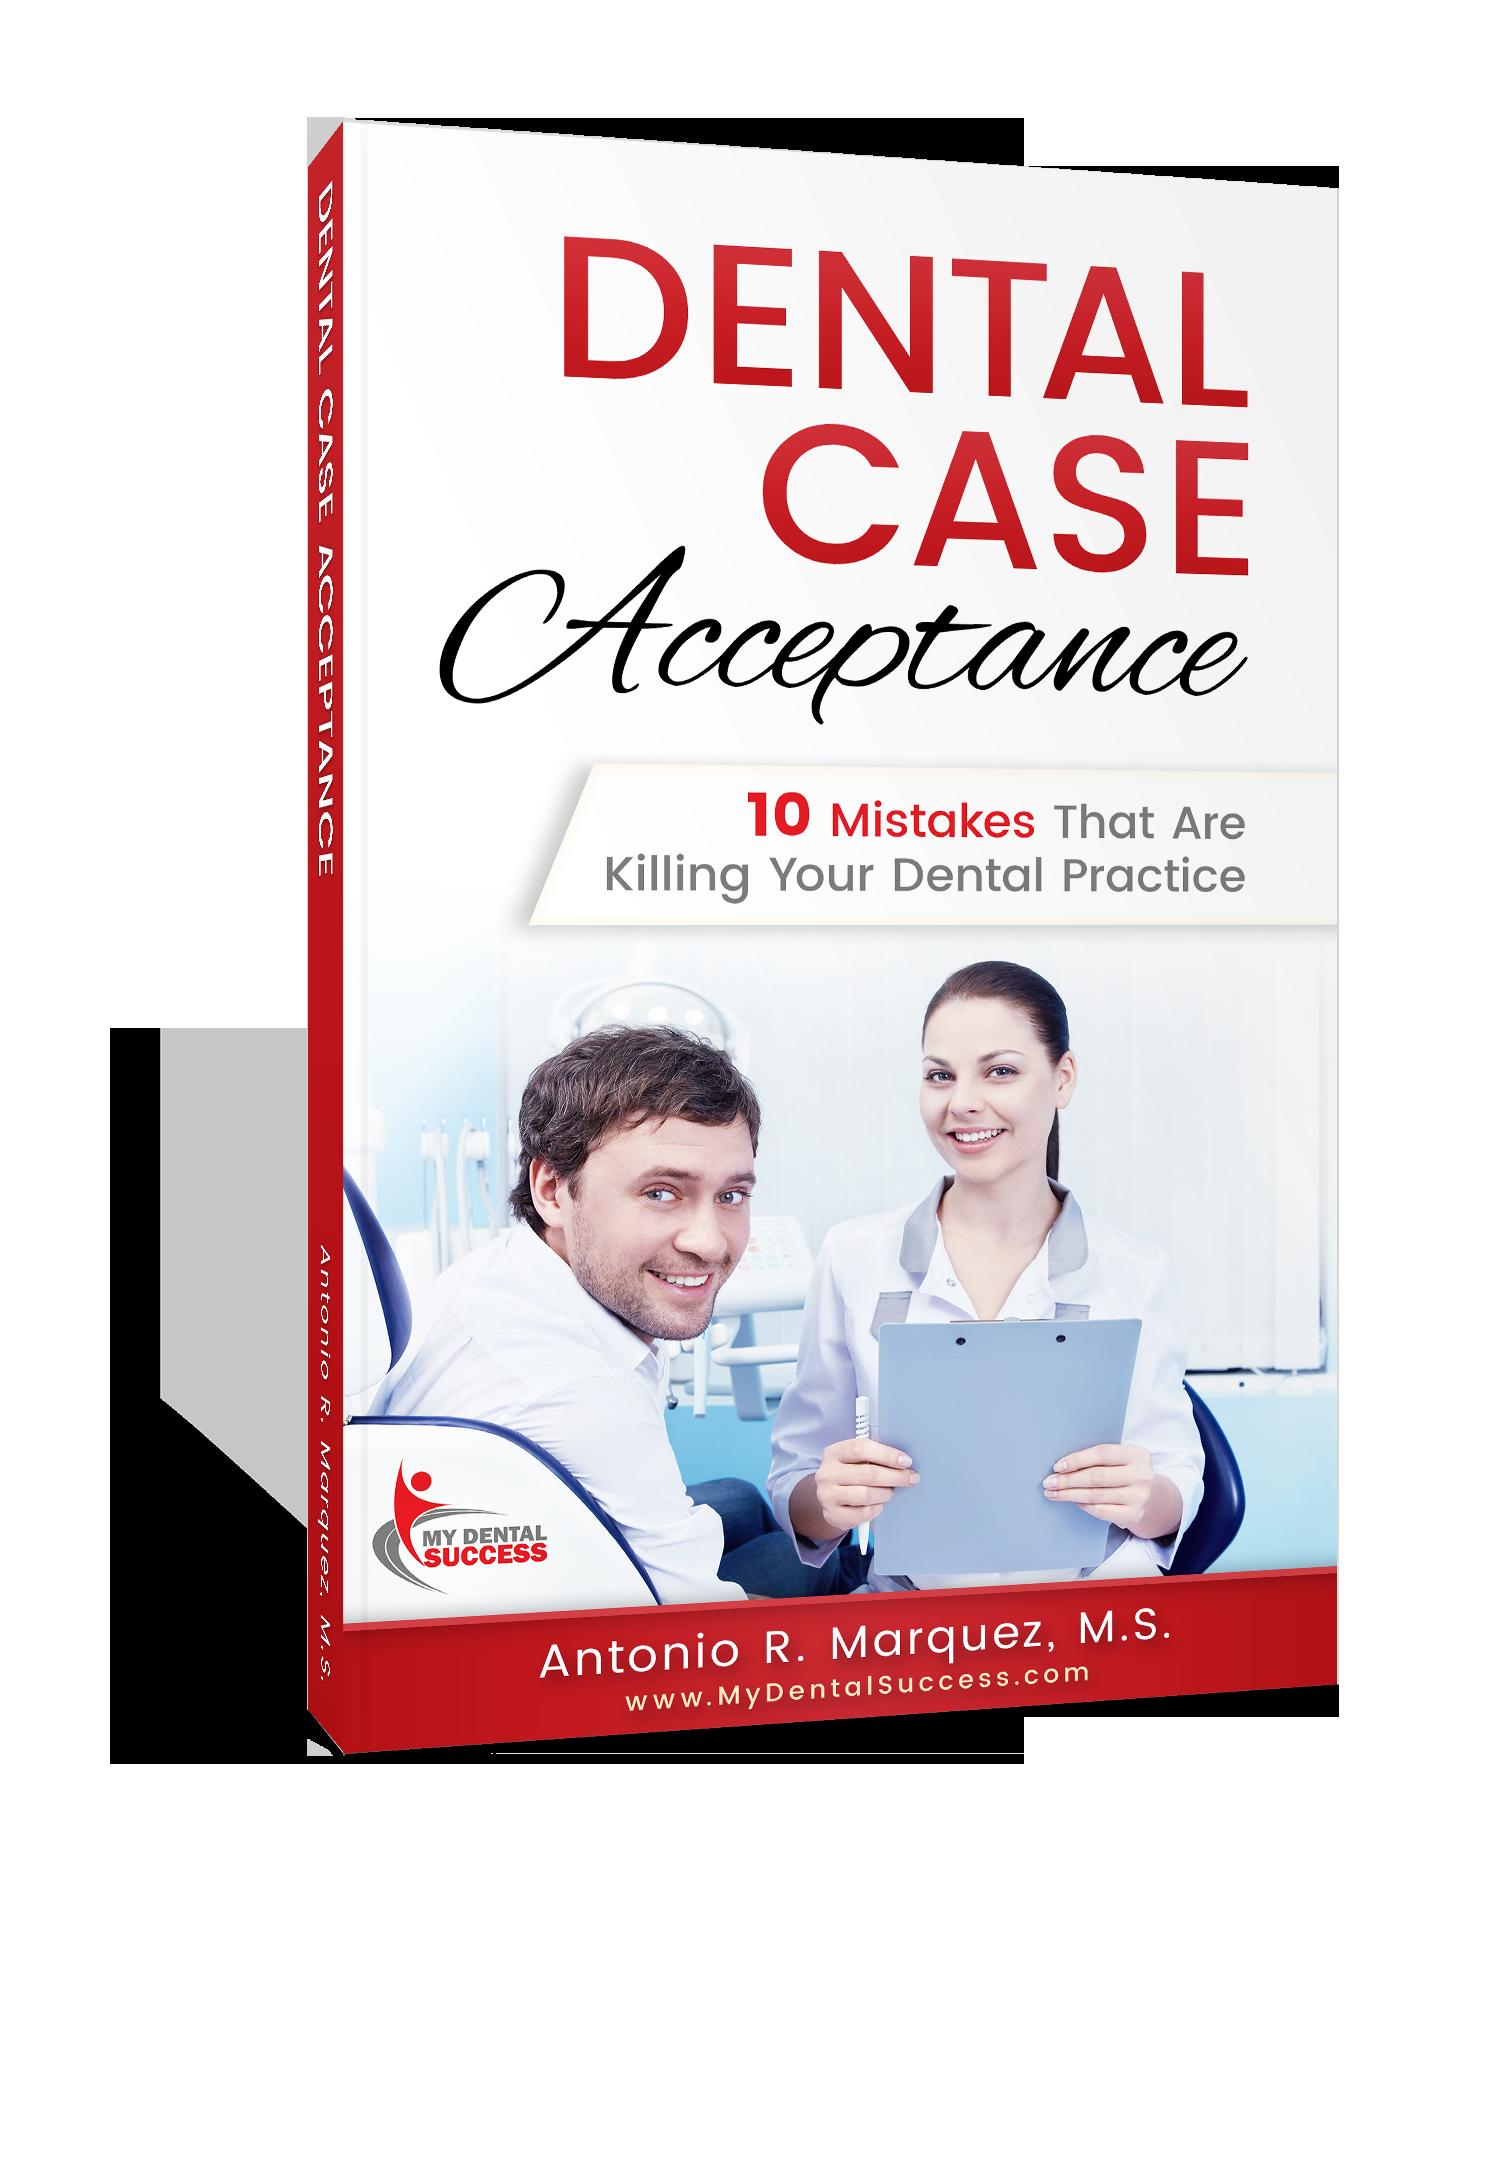 DentalCaseAcceptance-3D